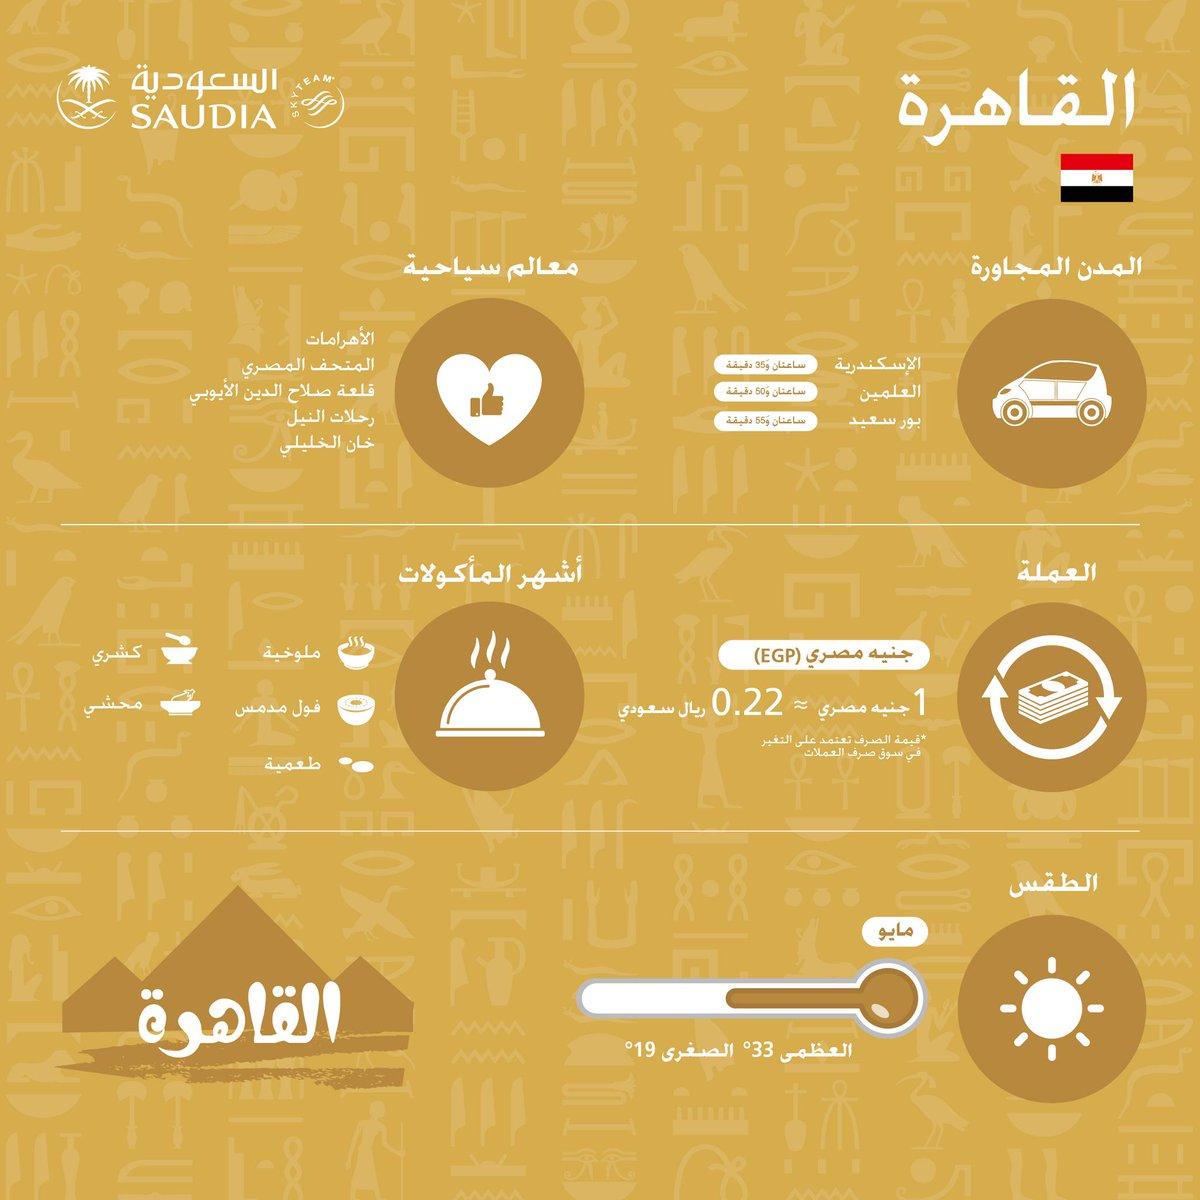 cb972984f SAUDIA | السعودية (@Saudi_Airlines) | Twitter